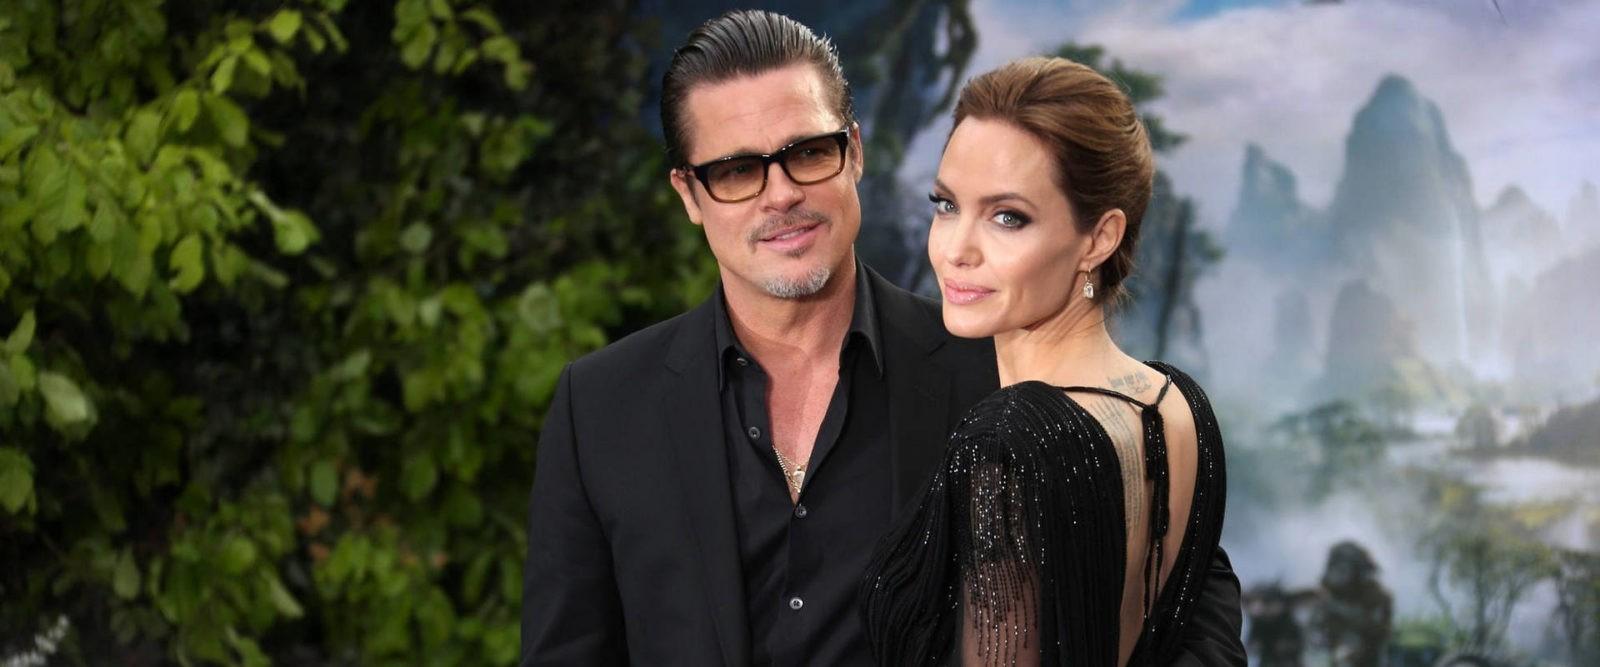 Брэд Питт выиграл суд у Анджелины Джоли